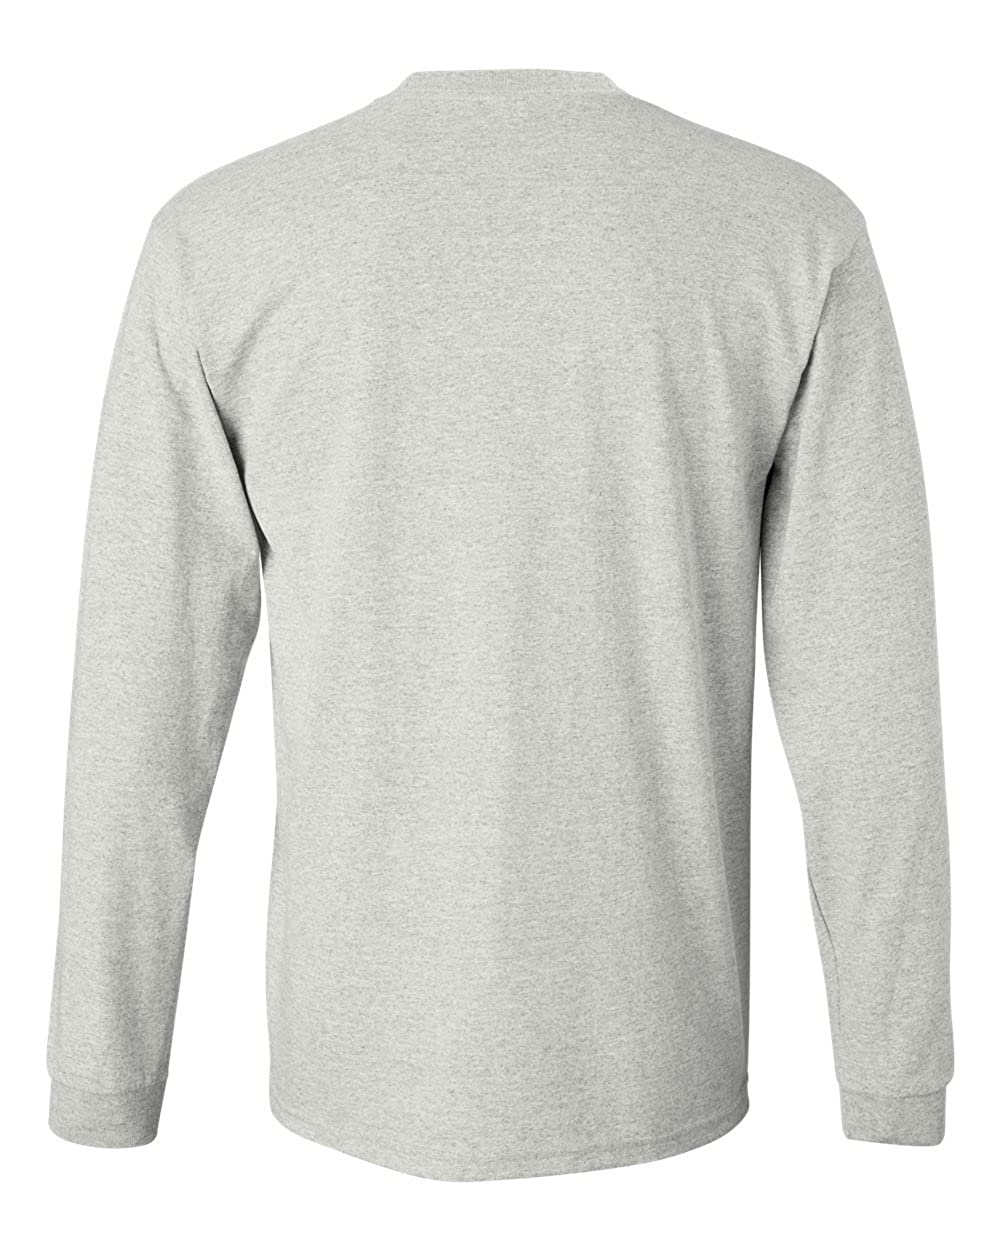 a4b501d9f554 Joe s USA Men s Long Sleeve Heavy Cotton Crew Neck T-Shirts in 27 ...